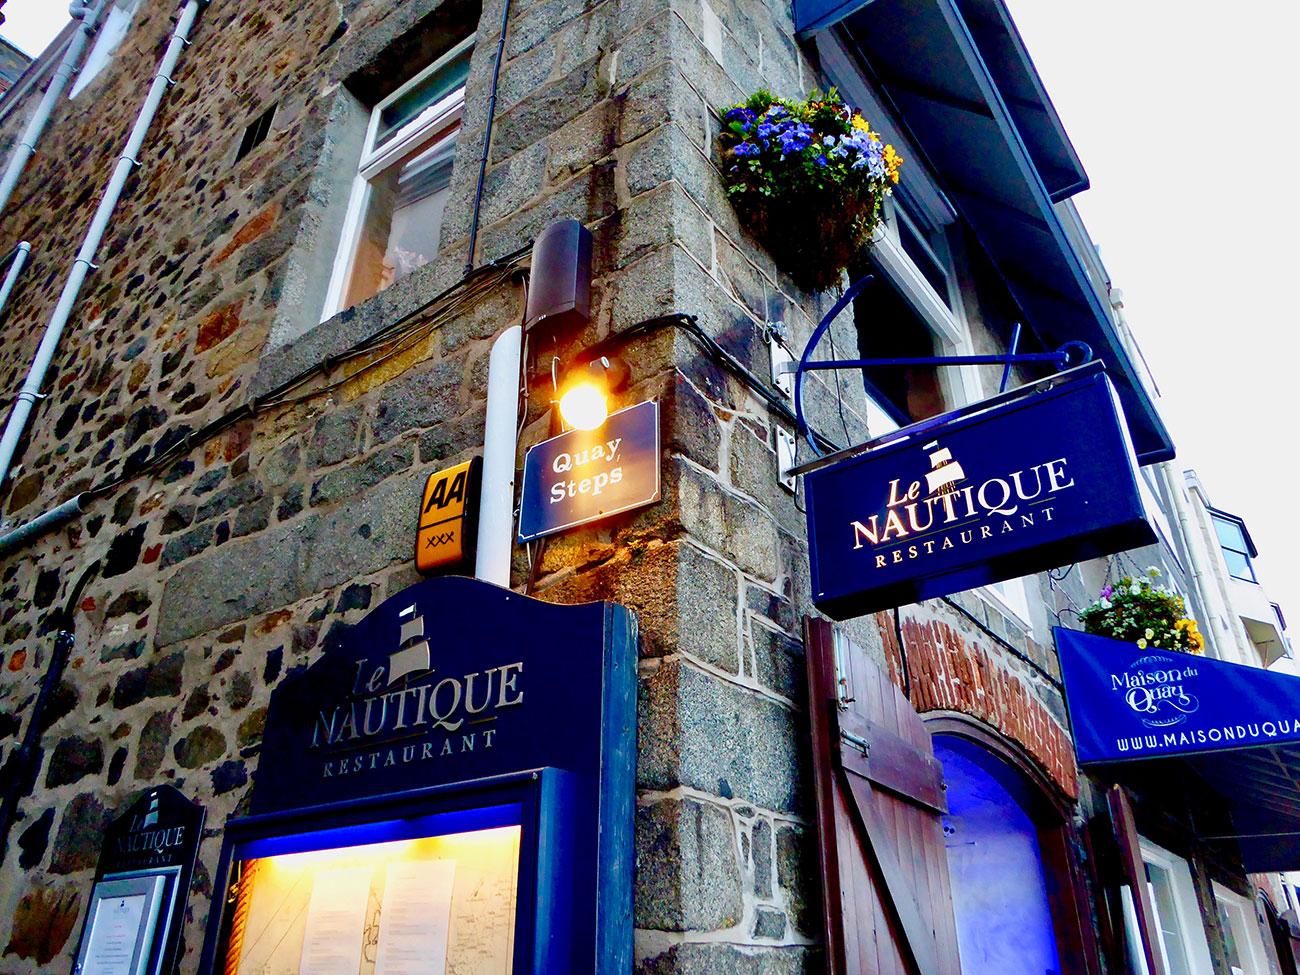 Le Nautique restaurant lies above the harbour in St Peter Port, Guernsey's capital